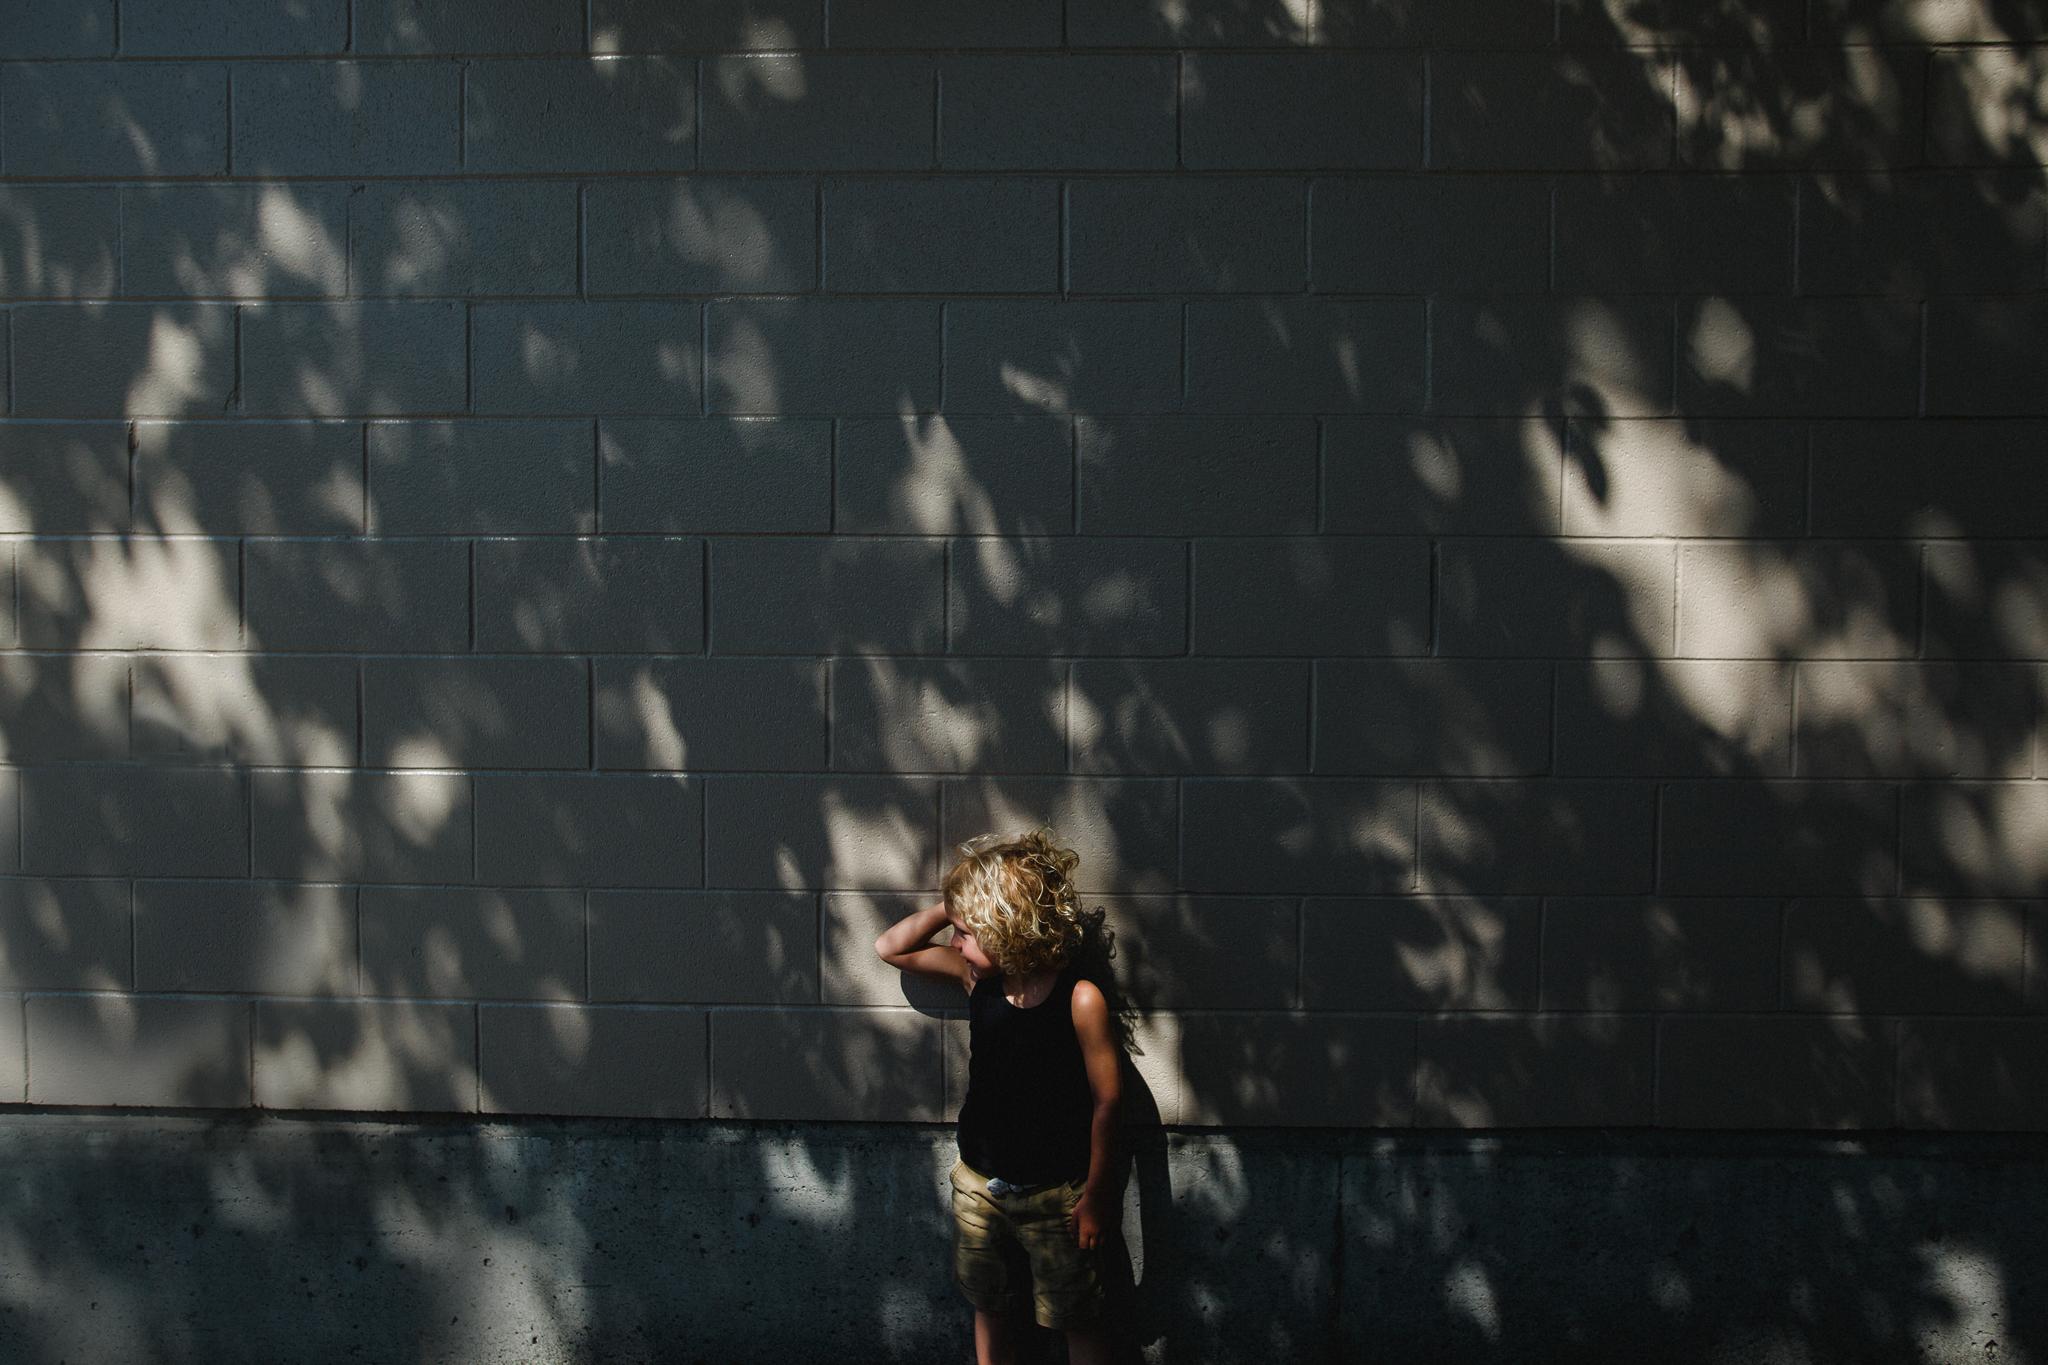 sully aberdeen shadows-1.jpg